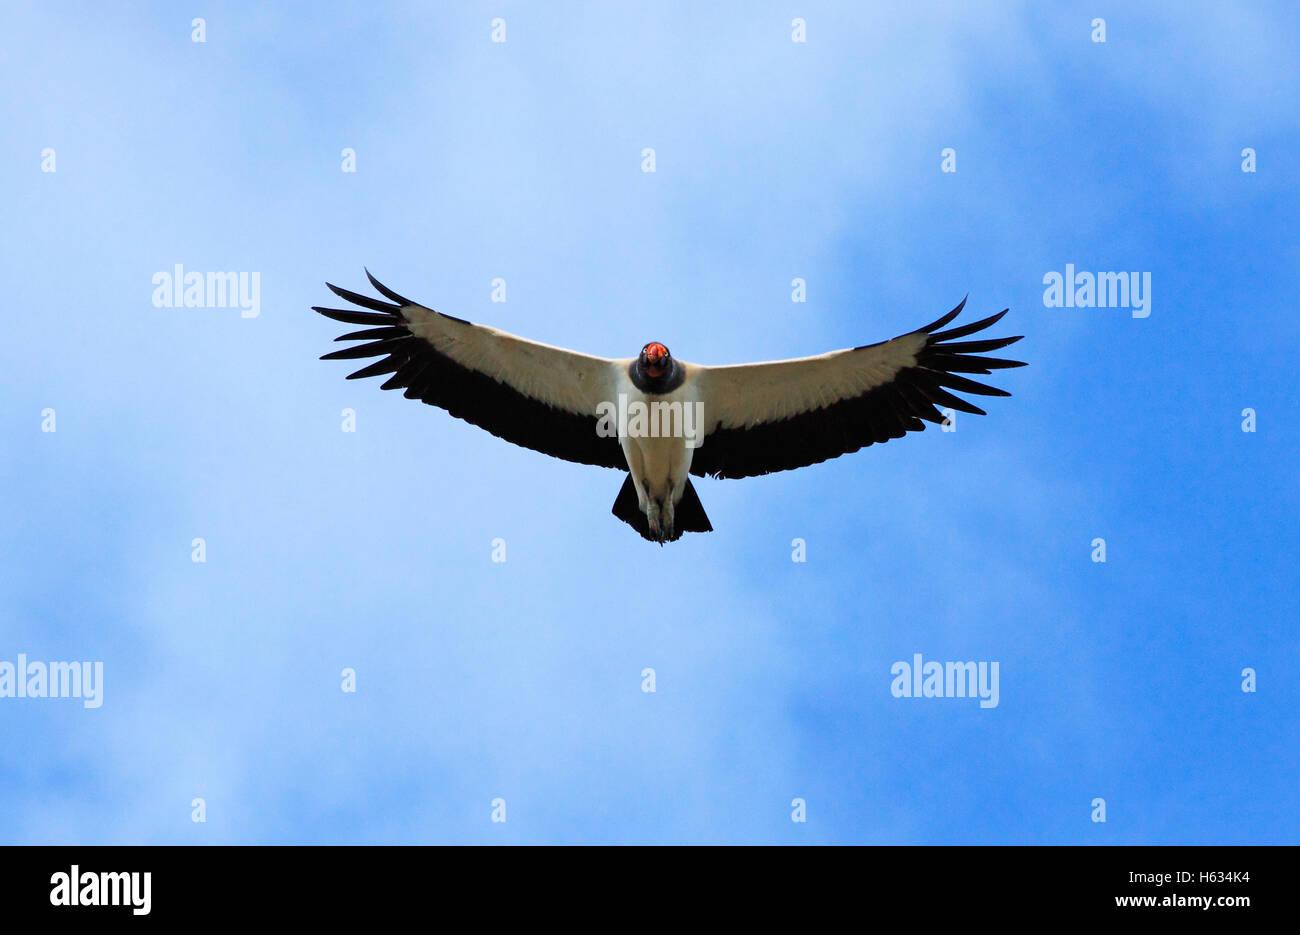 King vulture (Sarcoramphus; papa) in flight. Guanacaste, Costa Rica. - Stock Image